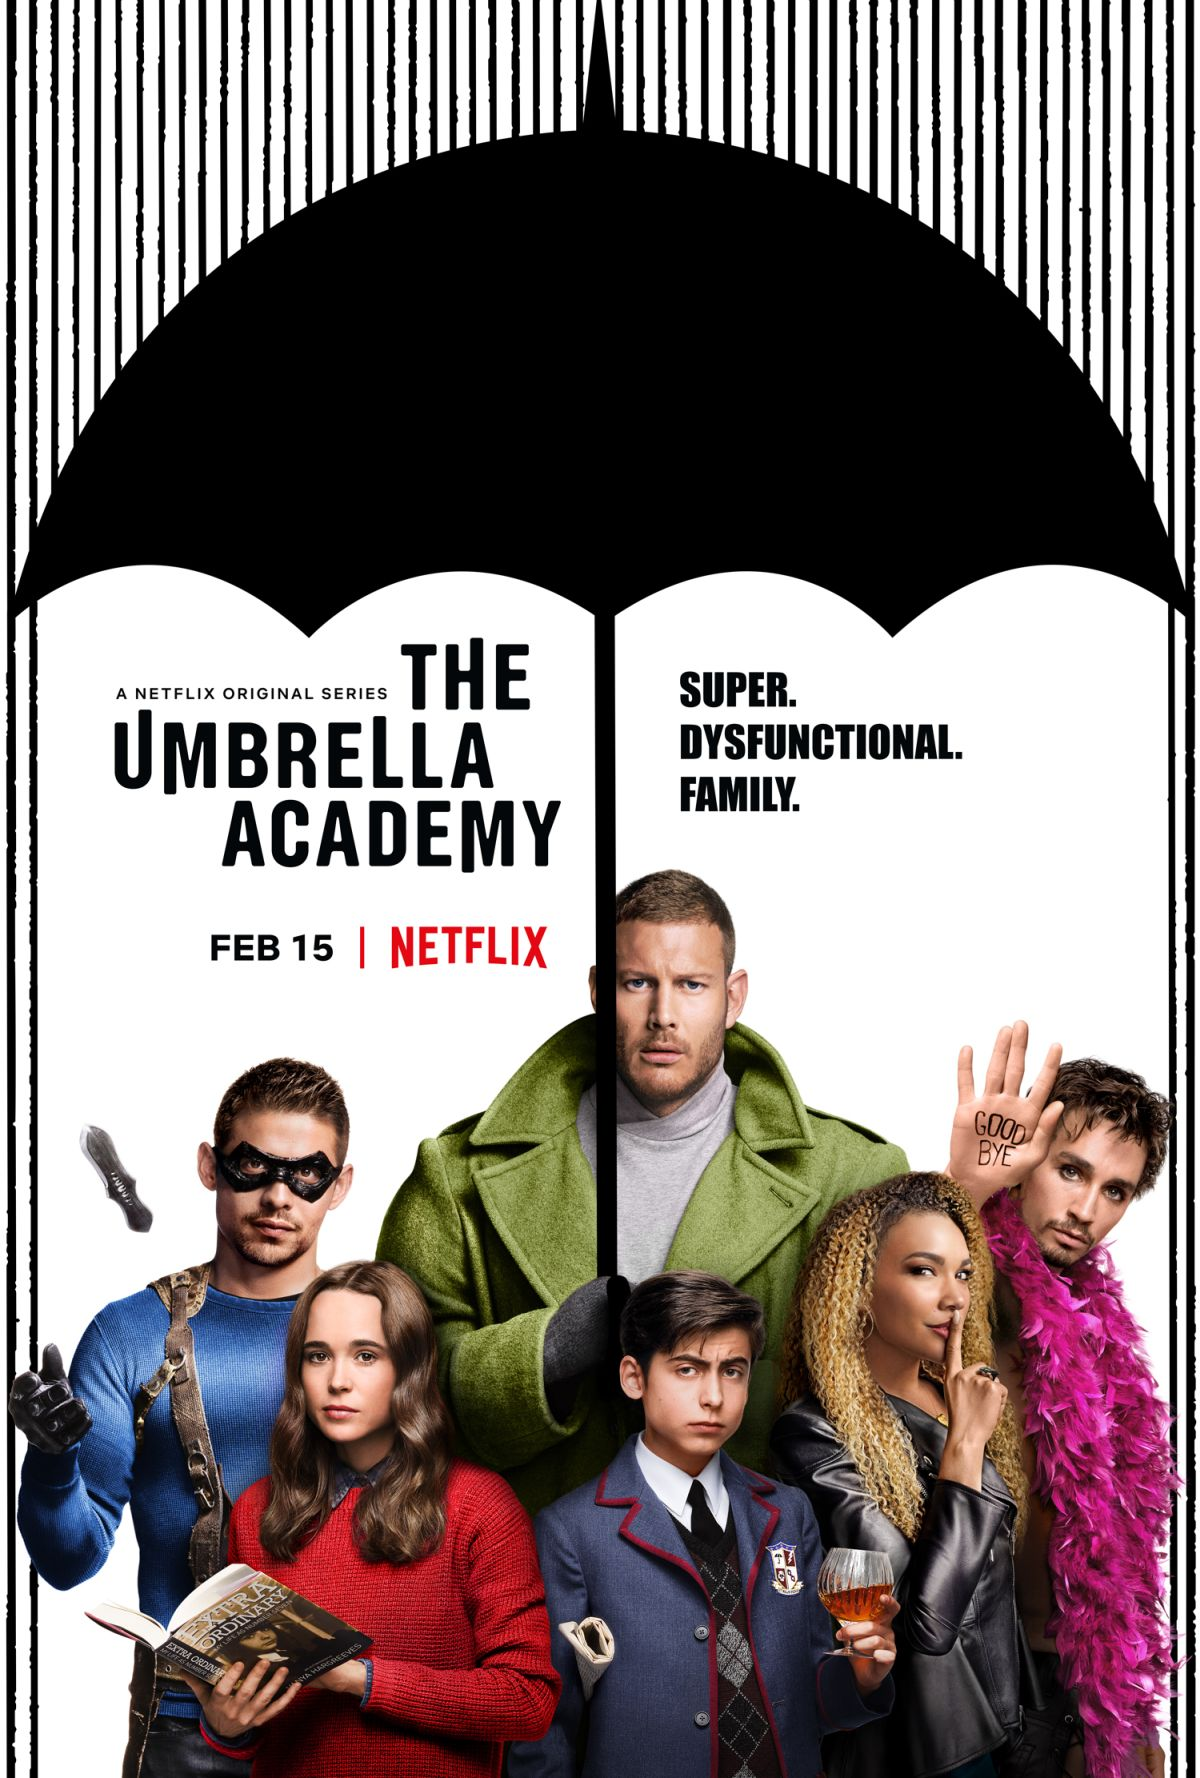 Академия Амбрелла, постер № 11